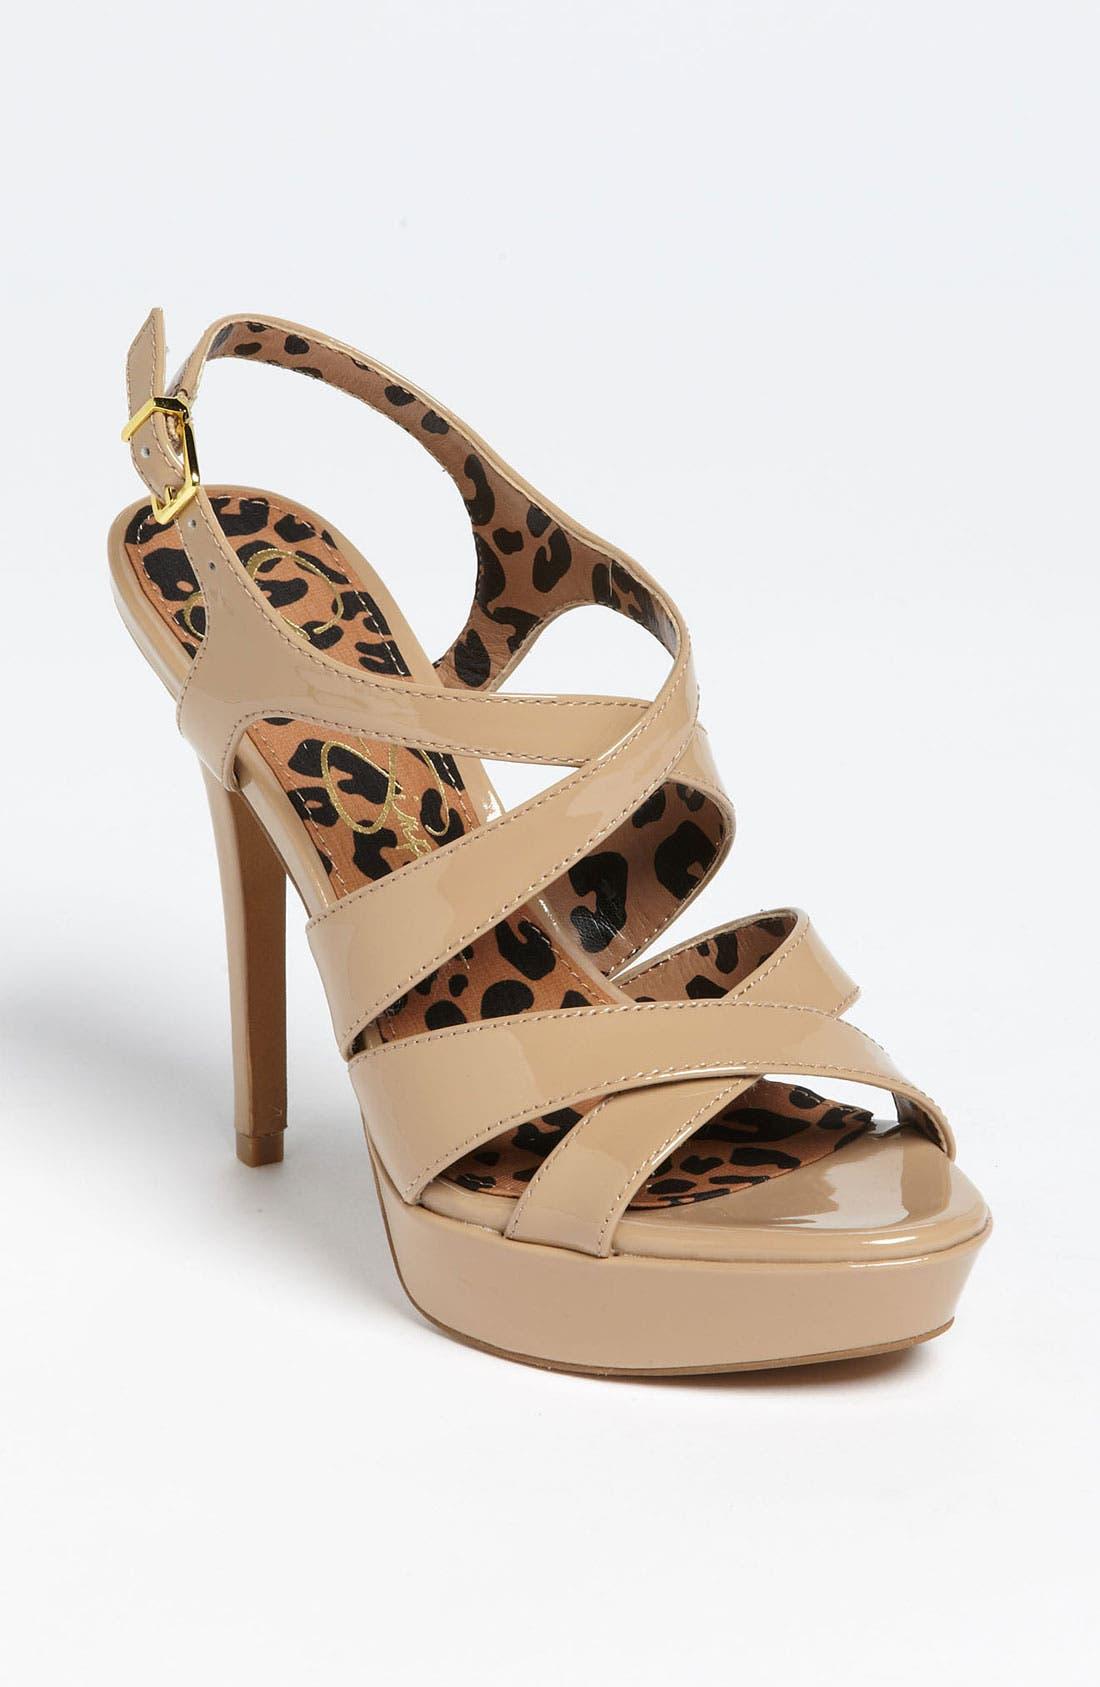 Main Image - Jessica Simpson 'Bianca' Sandal